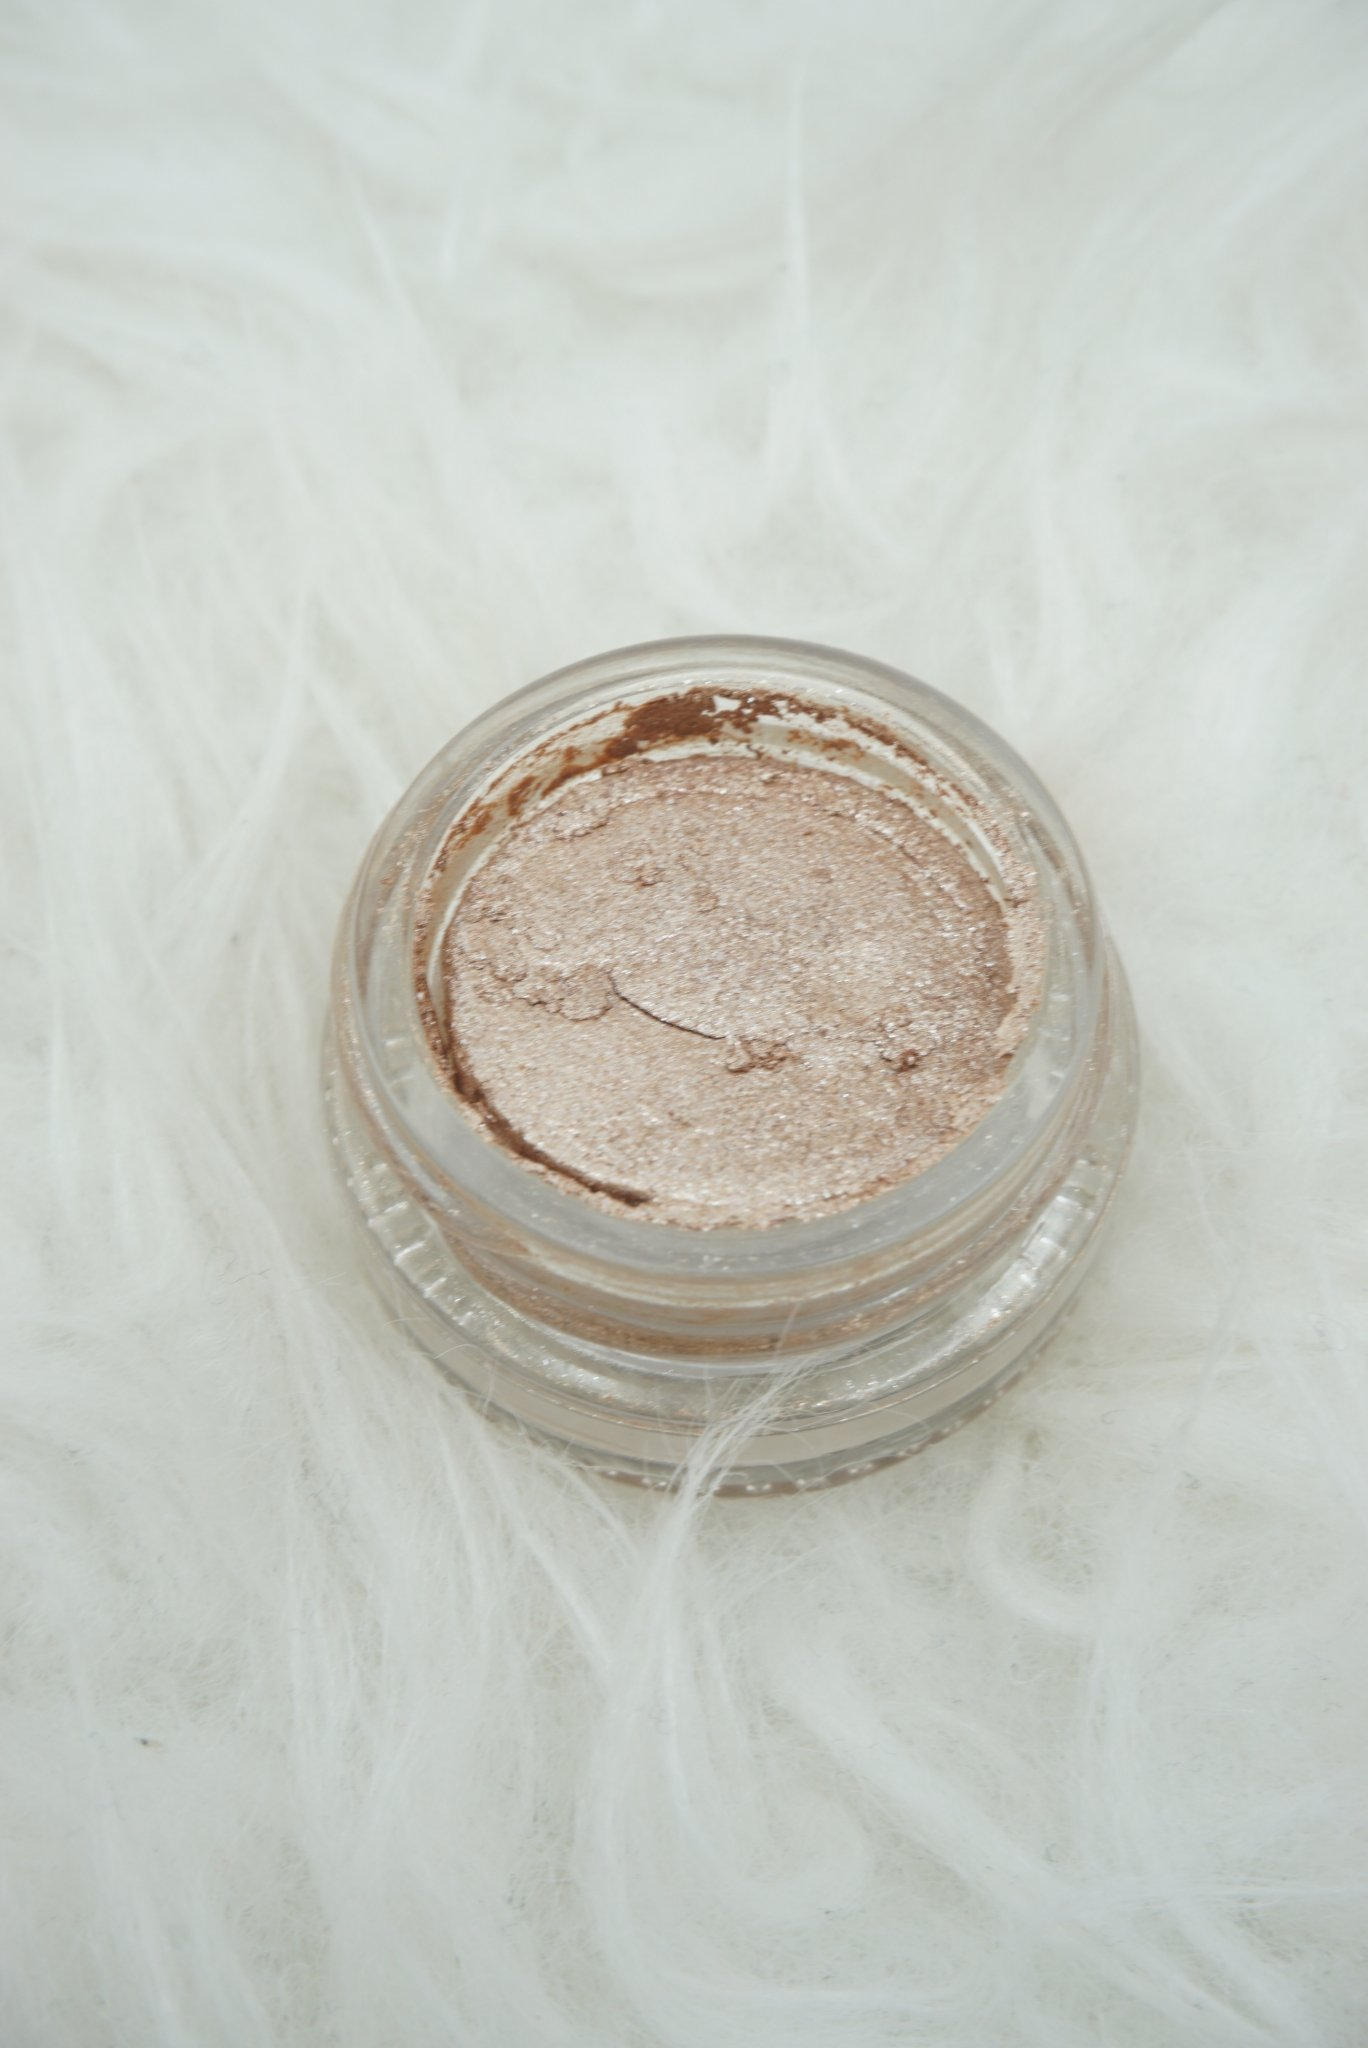 LORAC Cosmetics Créme Eyeshadow in Lace